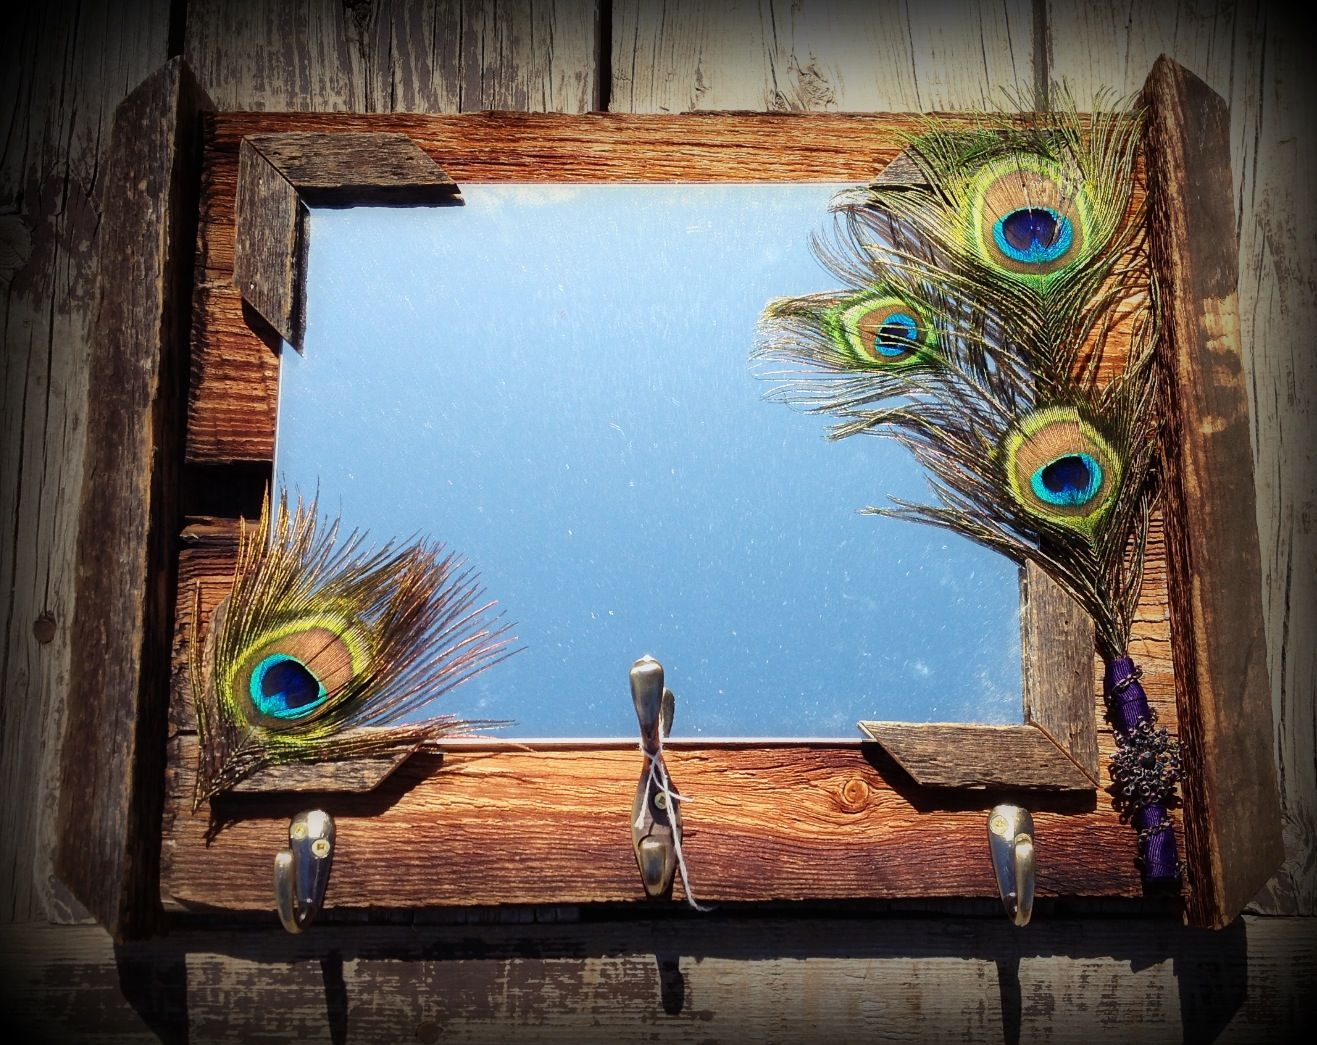 Barn board mirror with peacock feathers | Barn board ...